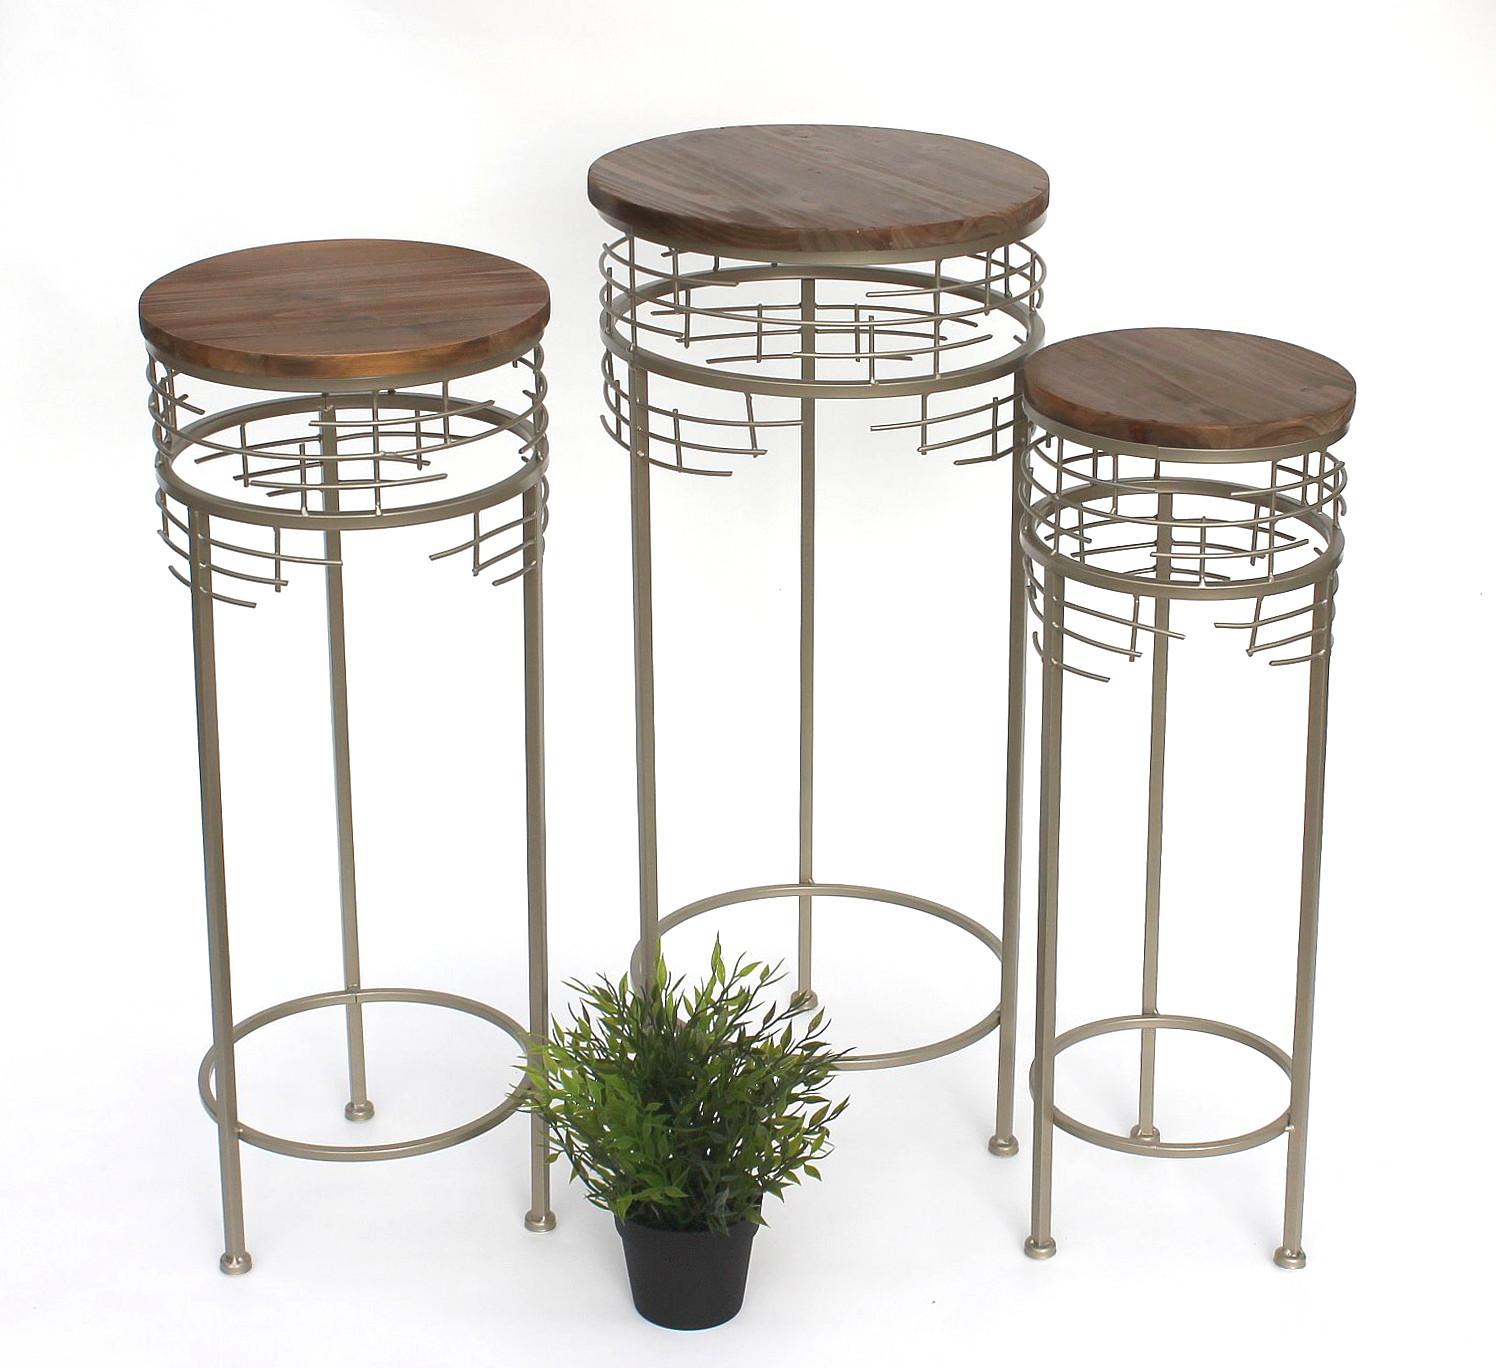 blumenhocker metall 21288 3er set blumenst nder rund. Black Bedroom Furniture Sets. Home Design Ideas